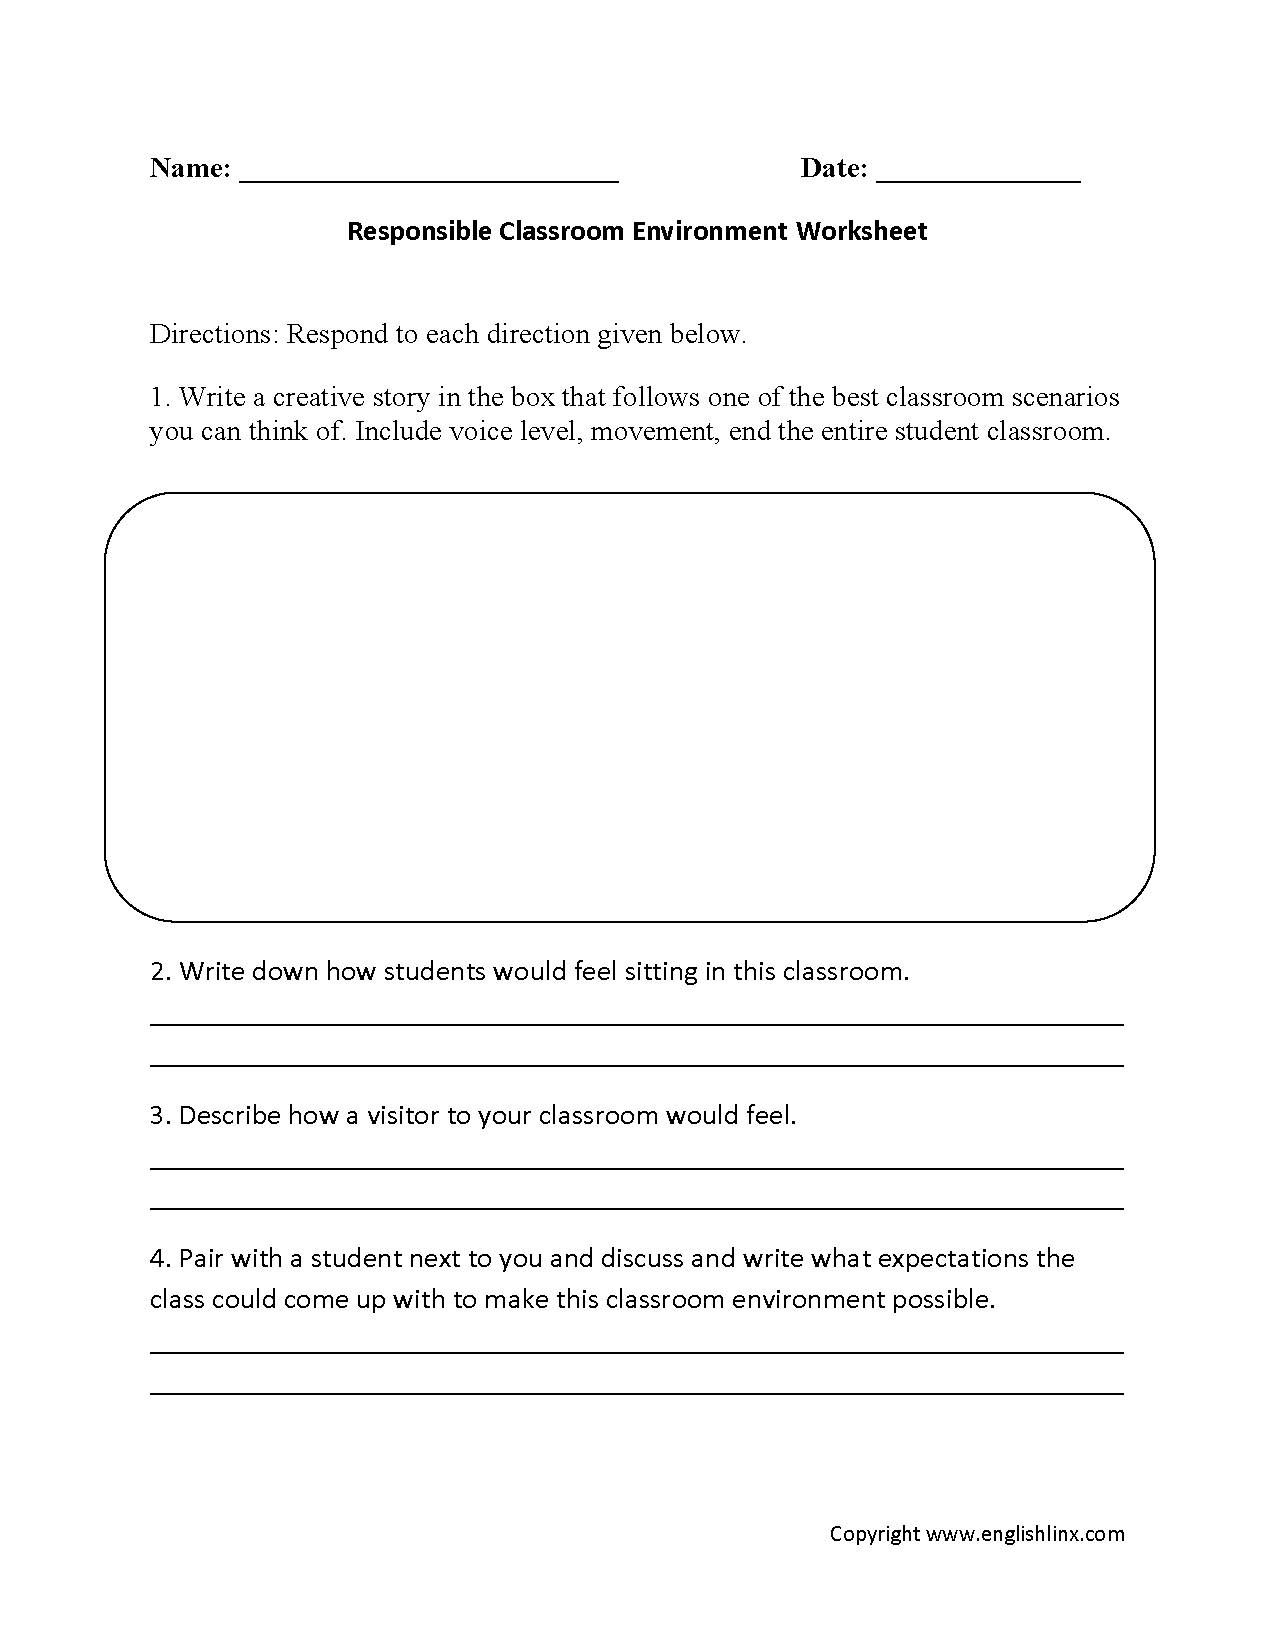 Englishlinx.com | Back to School Worksheets